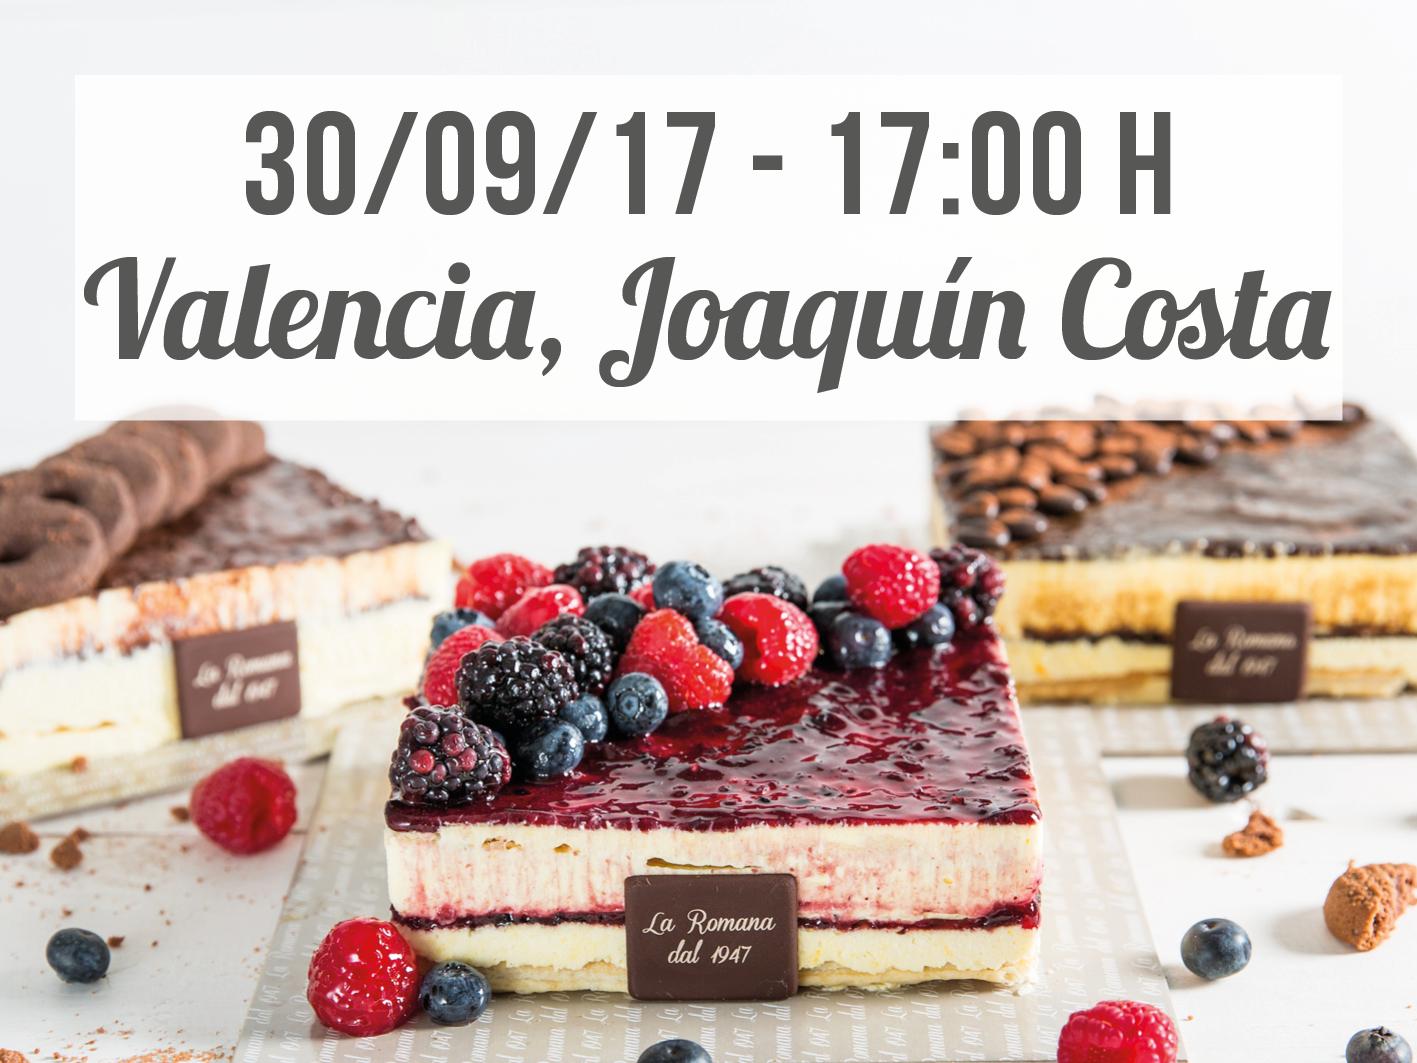 Valencia Calle Joaquín Costa Bakery Inauguration